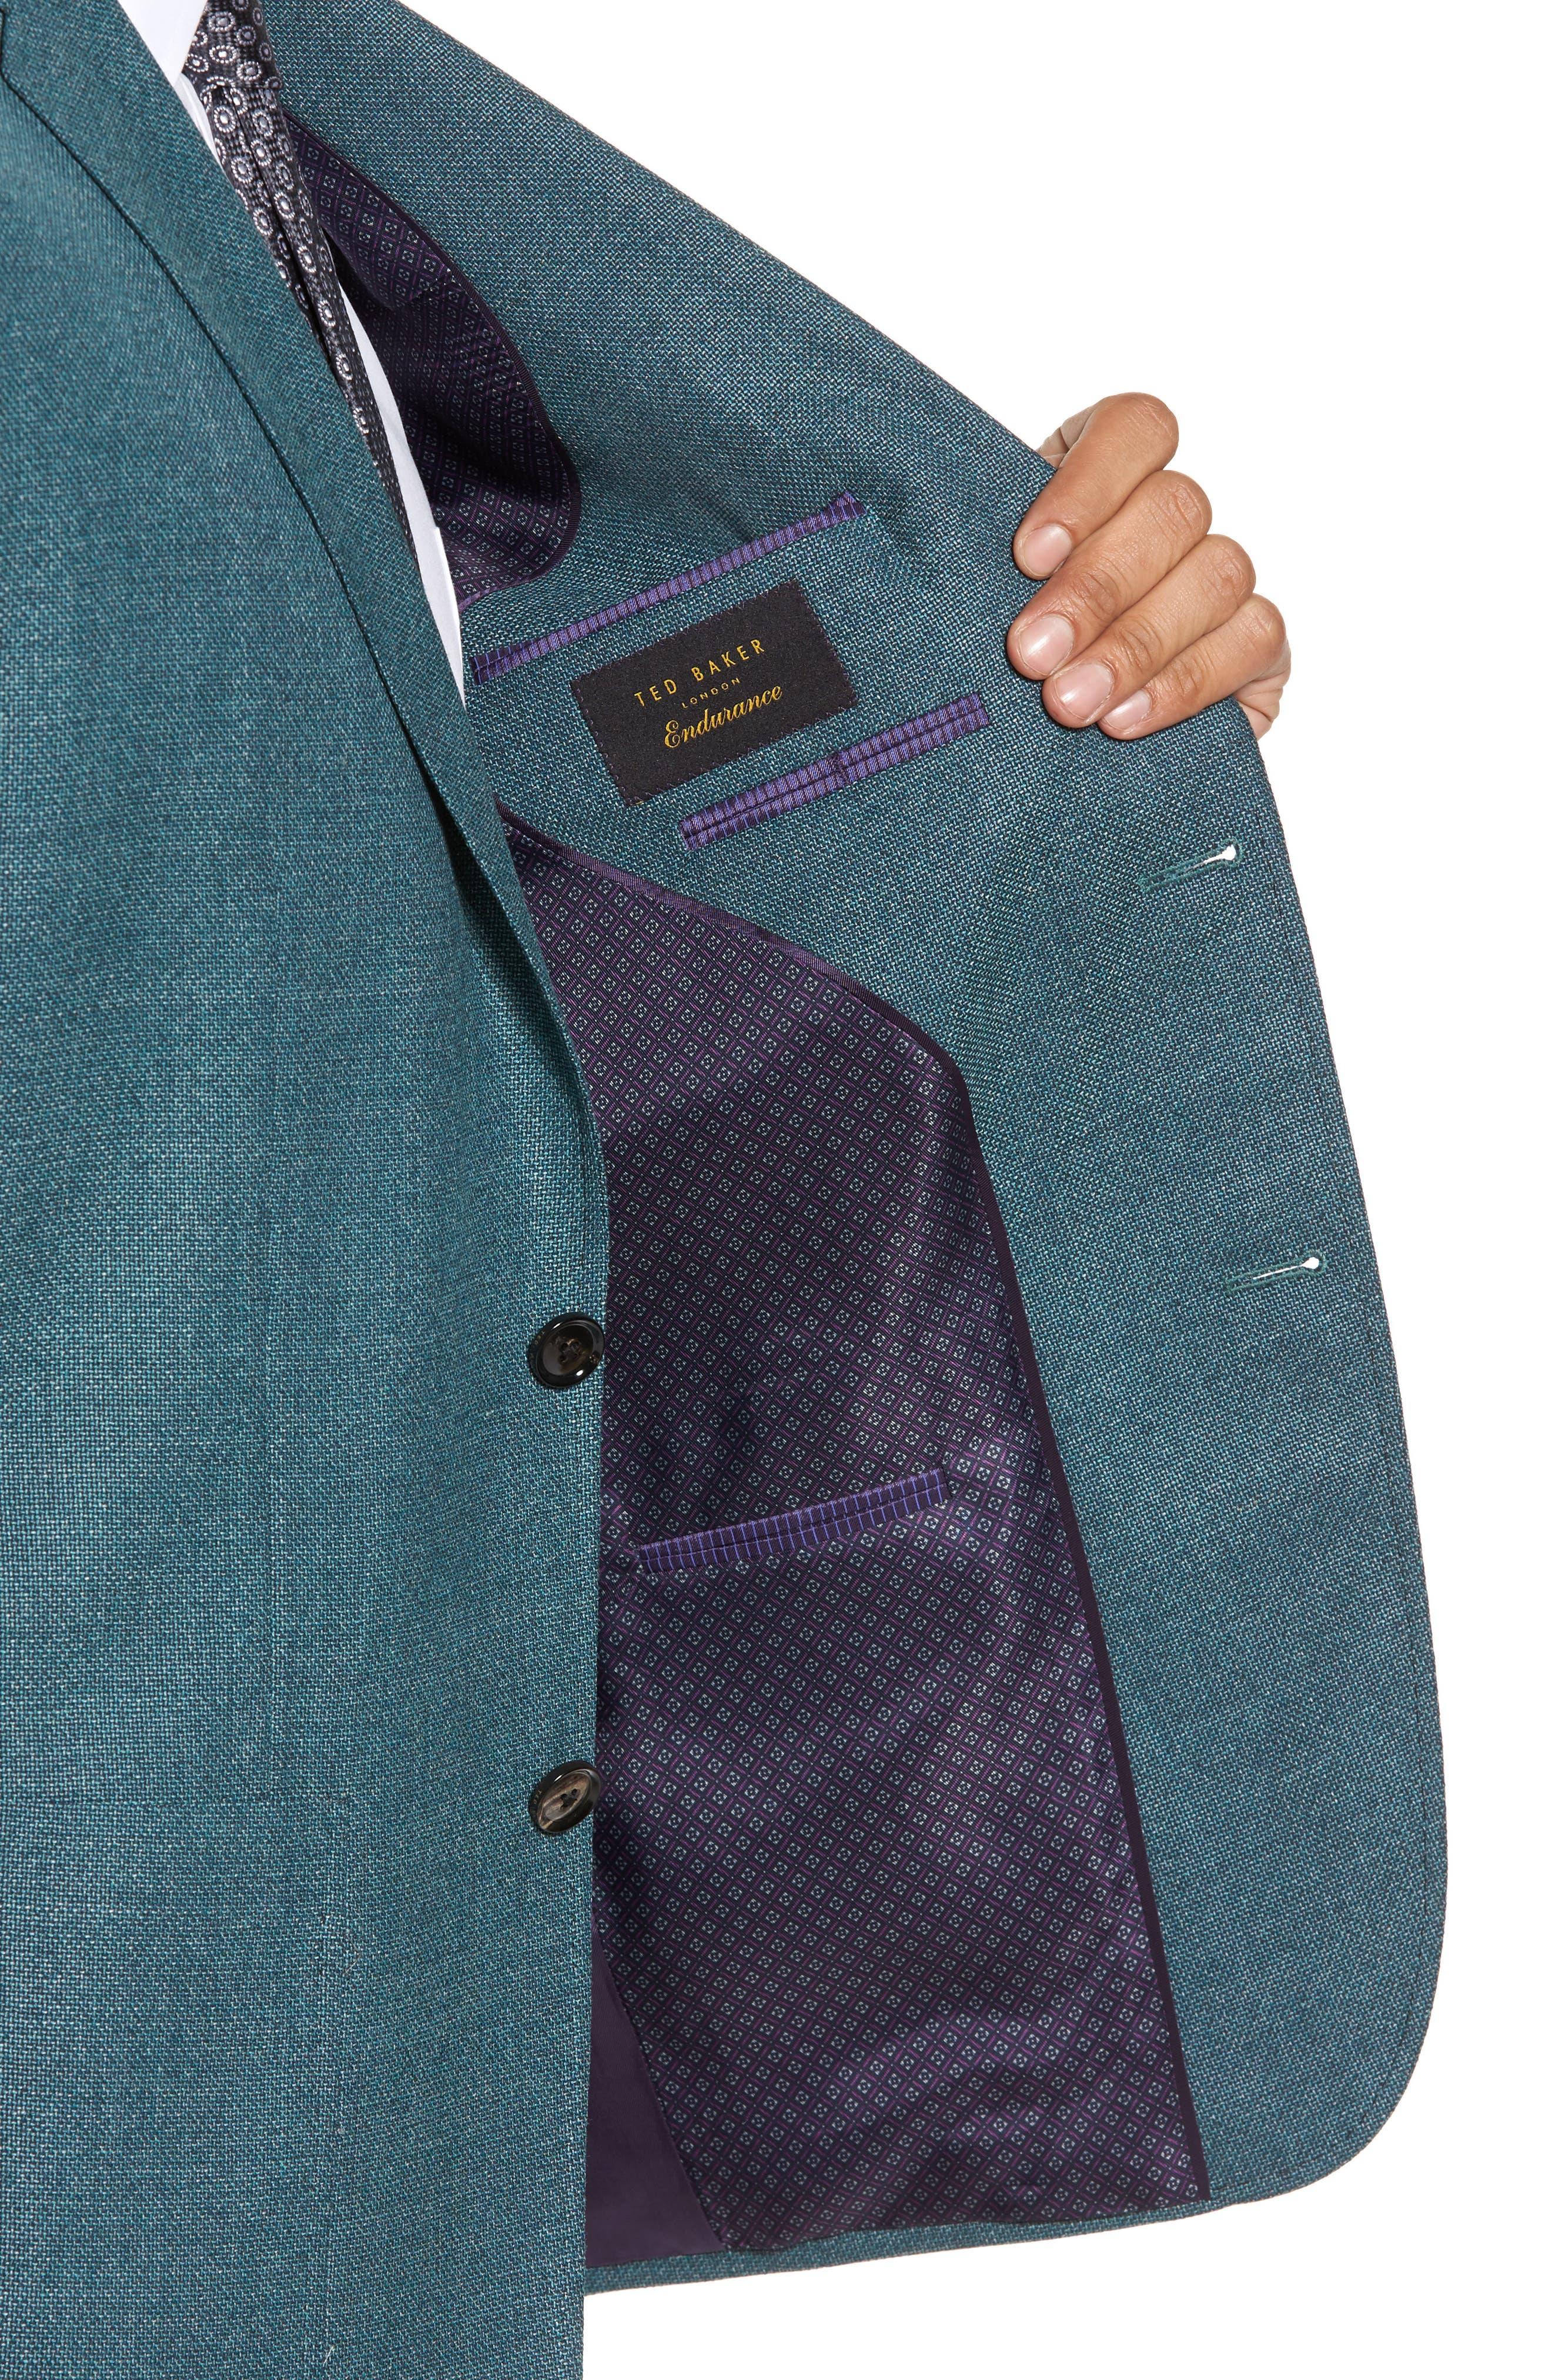 Kyle Trim Fit Wool Blazer,                             Alternate thumbnail 4, color,                             Teal Blue